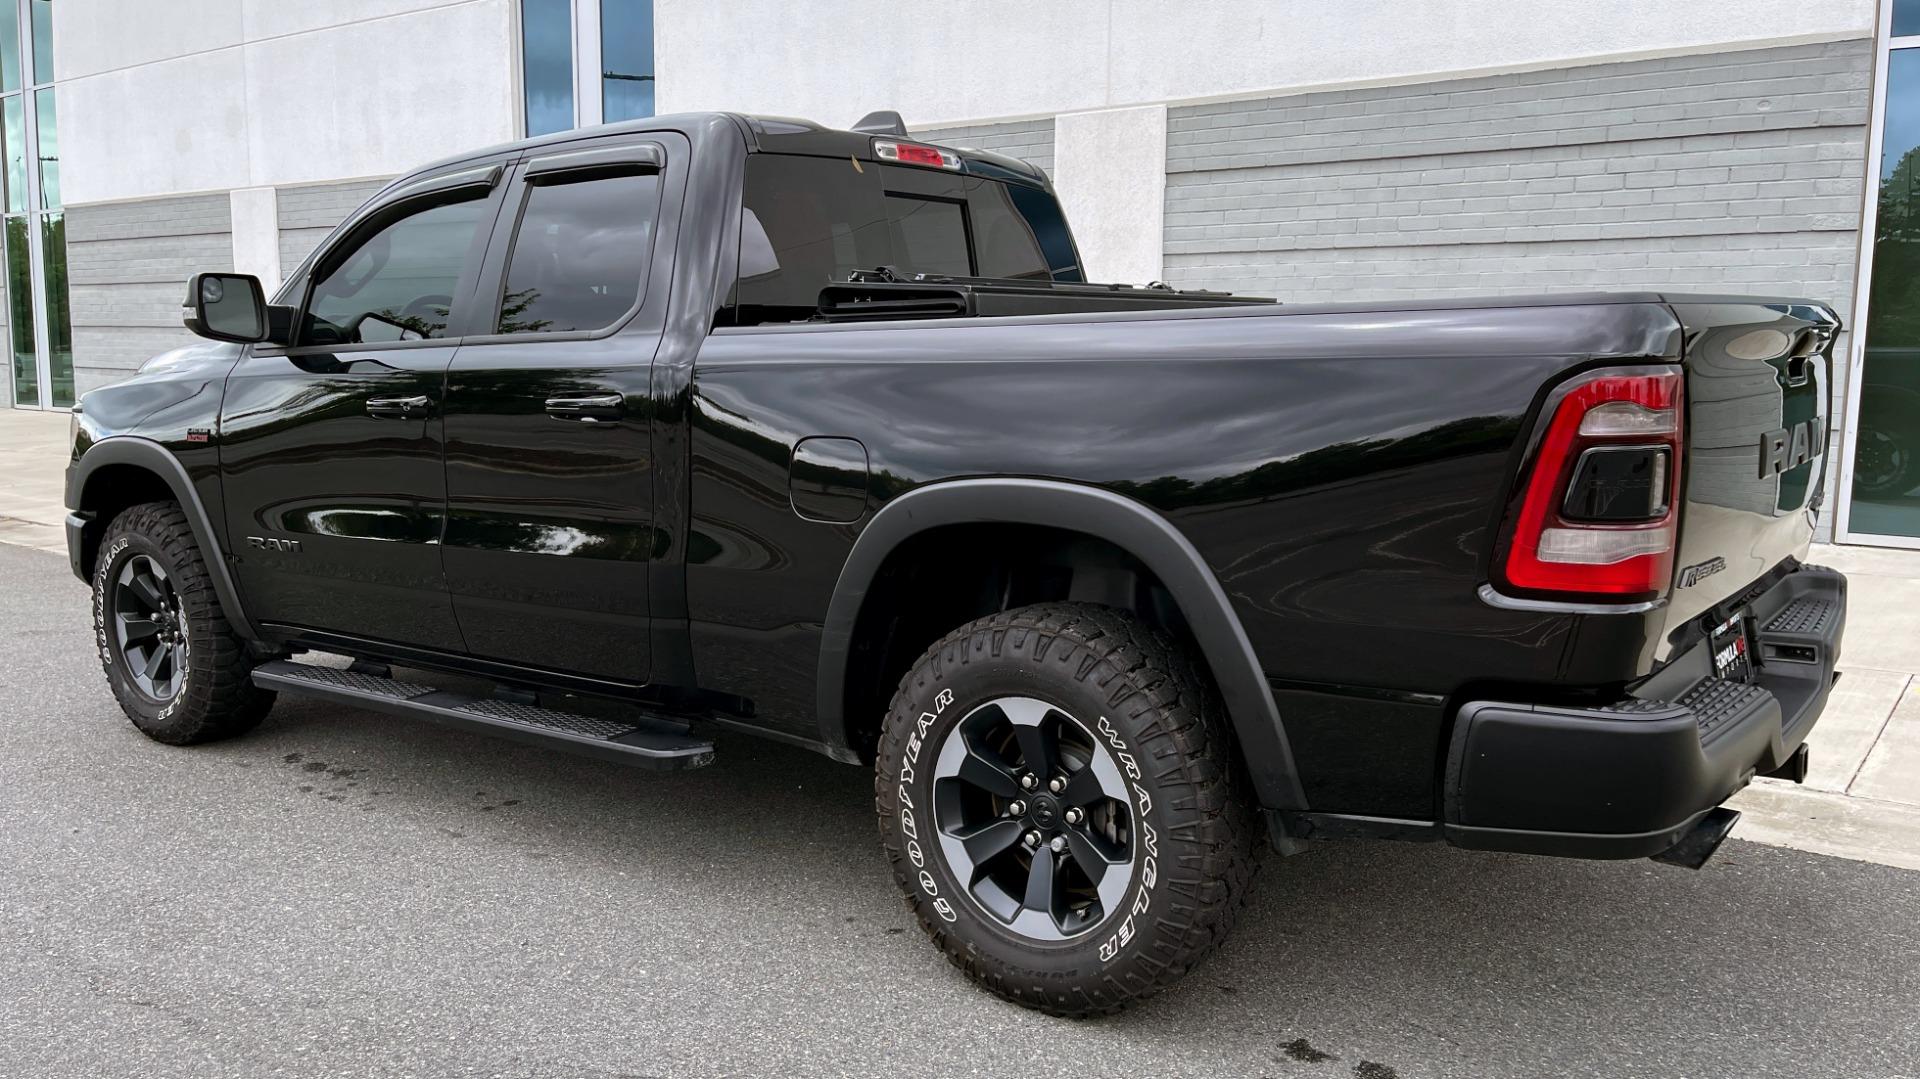 Used 2019 Ram 1500 REBEL QUADCAB 4X4 / 5.7L HEMI / 8-SPD AUTO / REMOTE START / PARK ASSIST for sale $44,495 at Formula Imports in Charlotte NC 28227 5